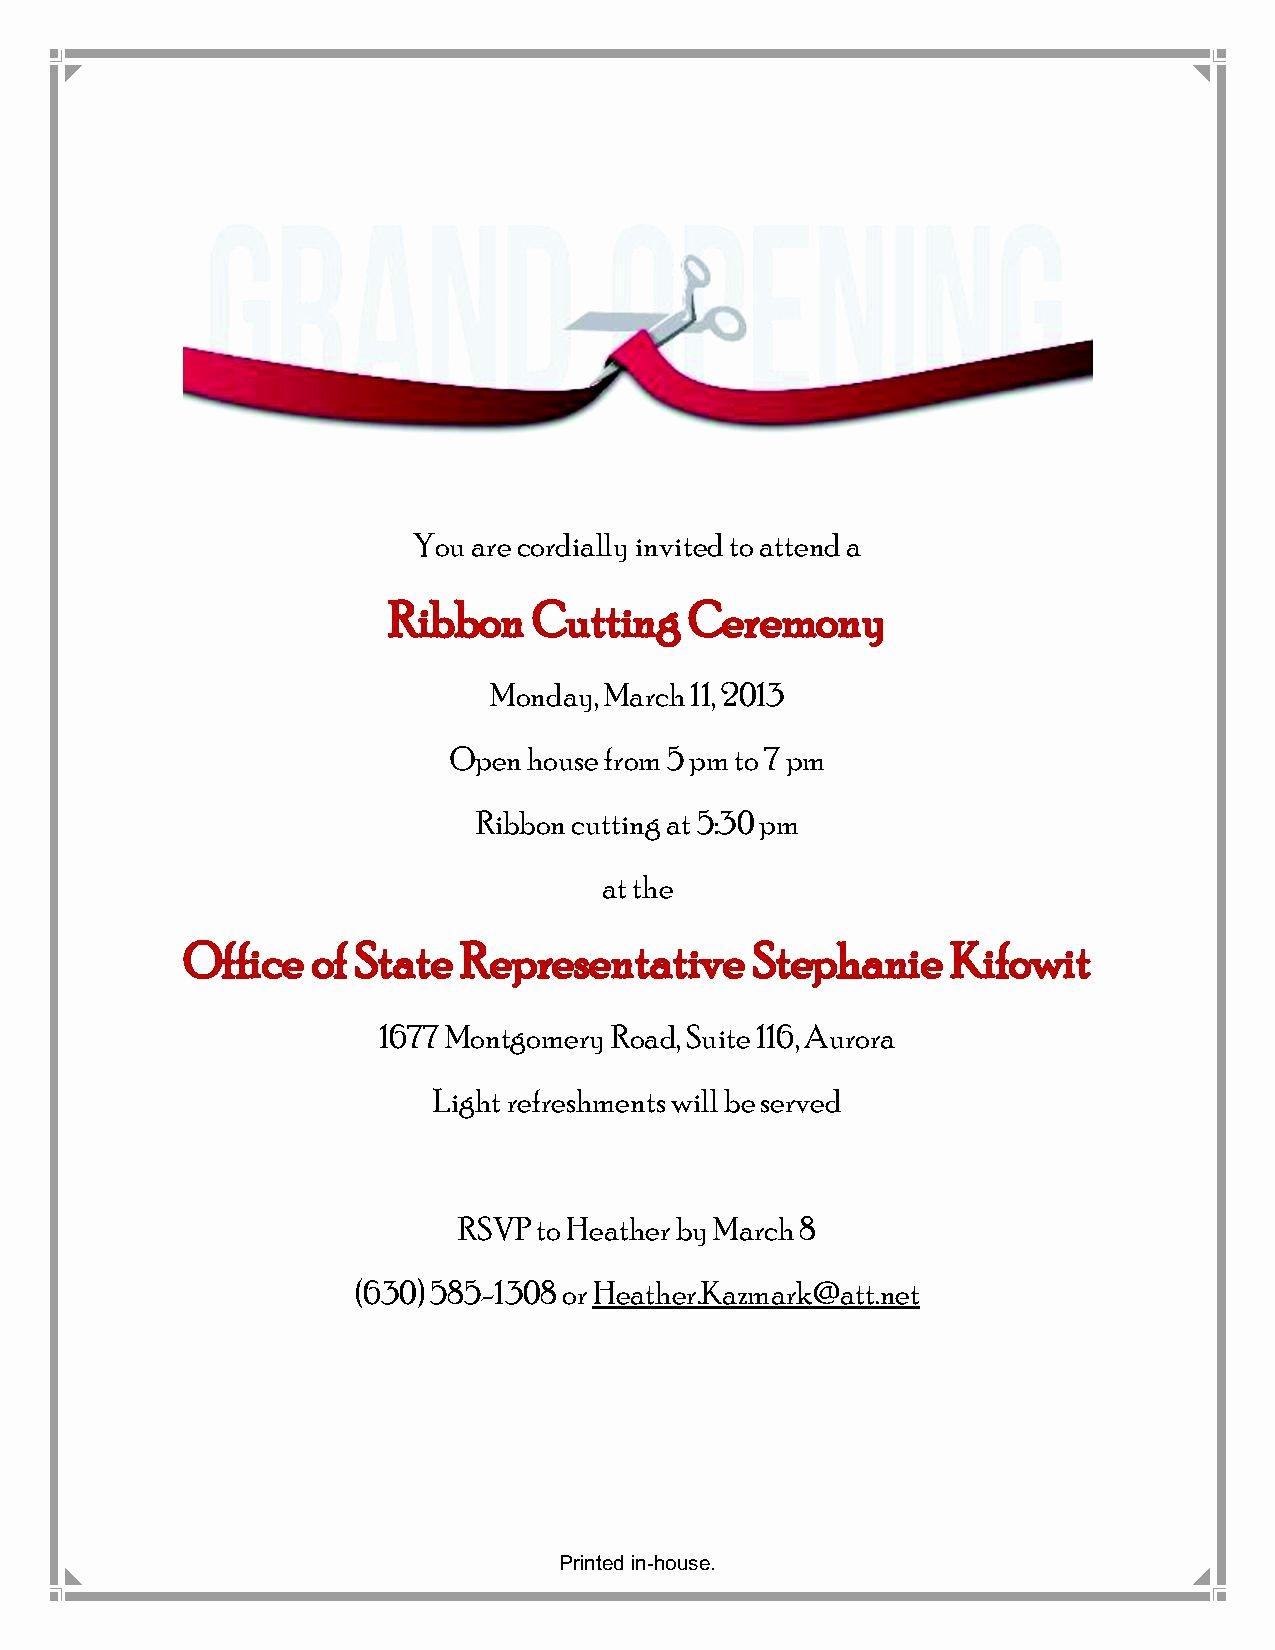 Ribbon Cutting Ceremony Invitation Template New Swearing In Ceremony Invitation